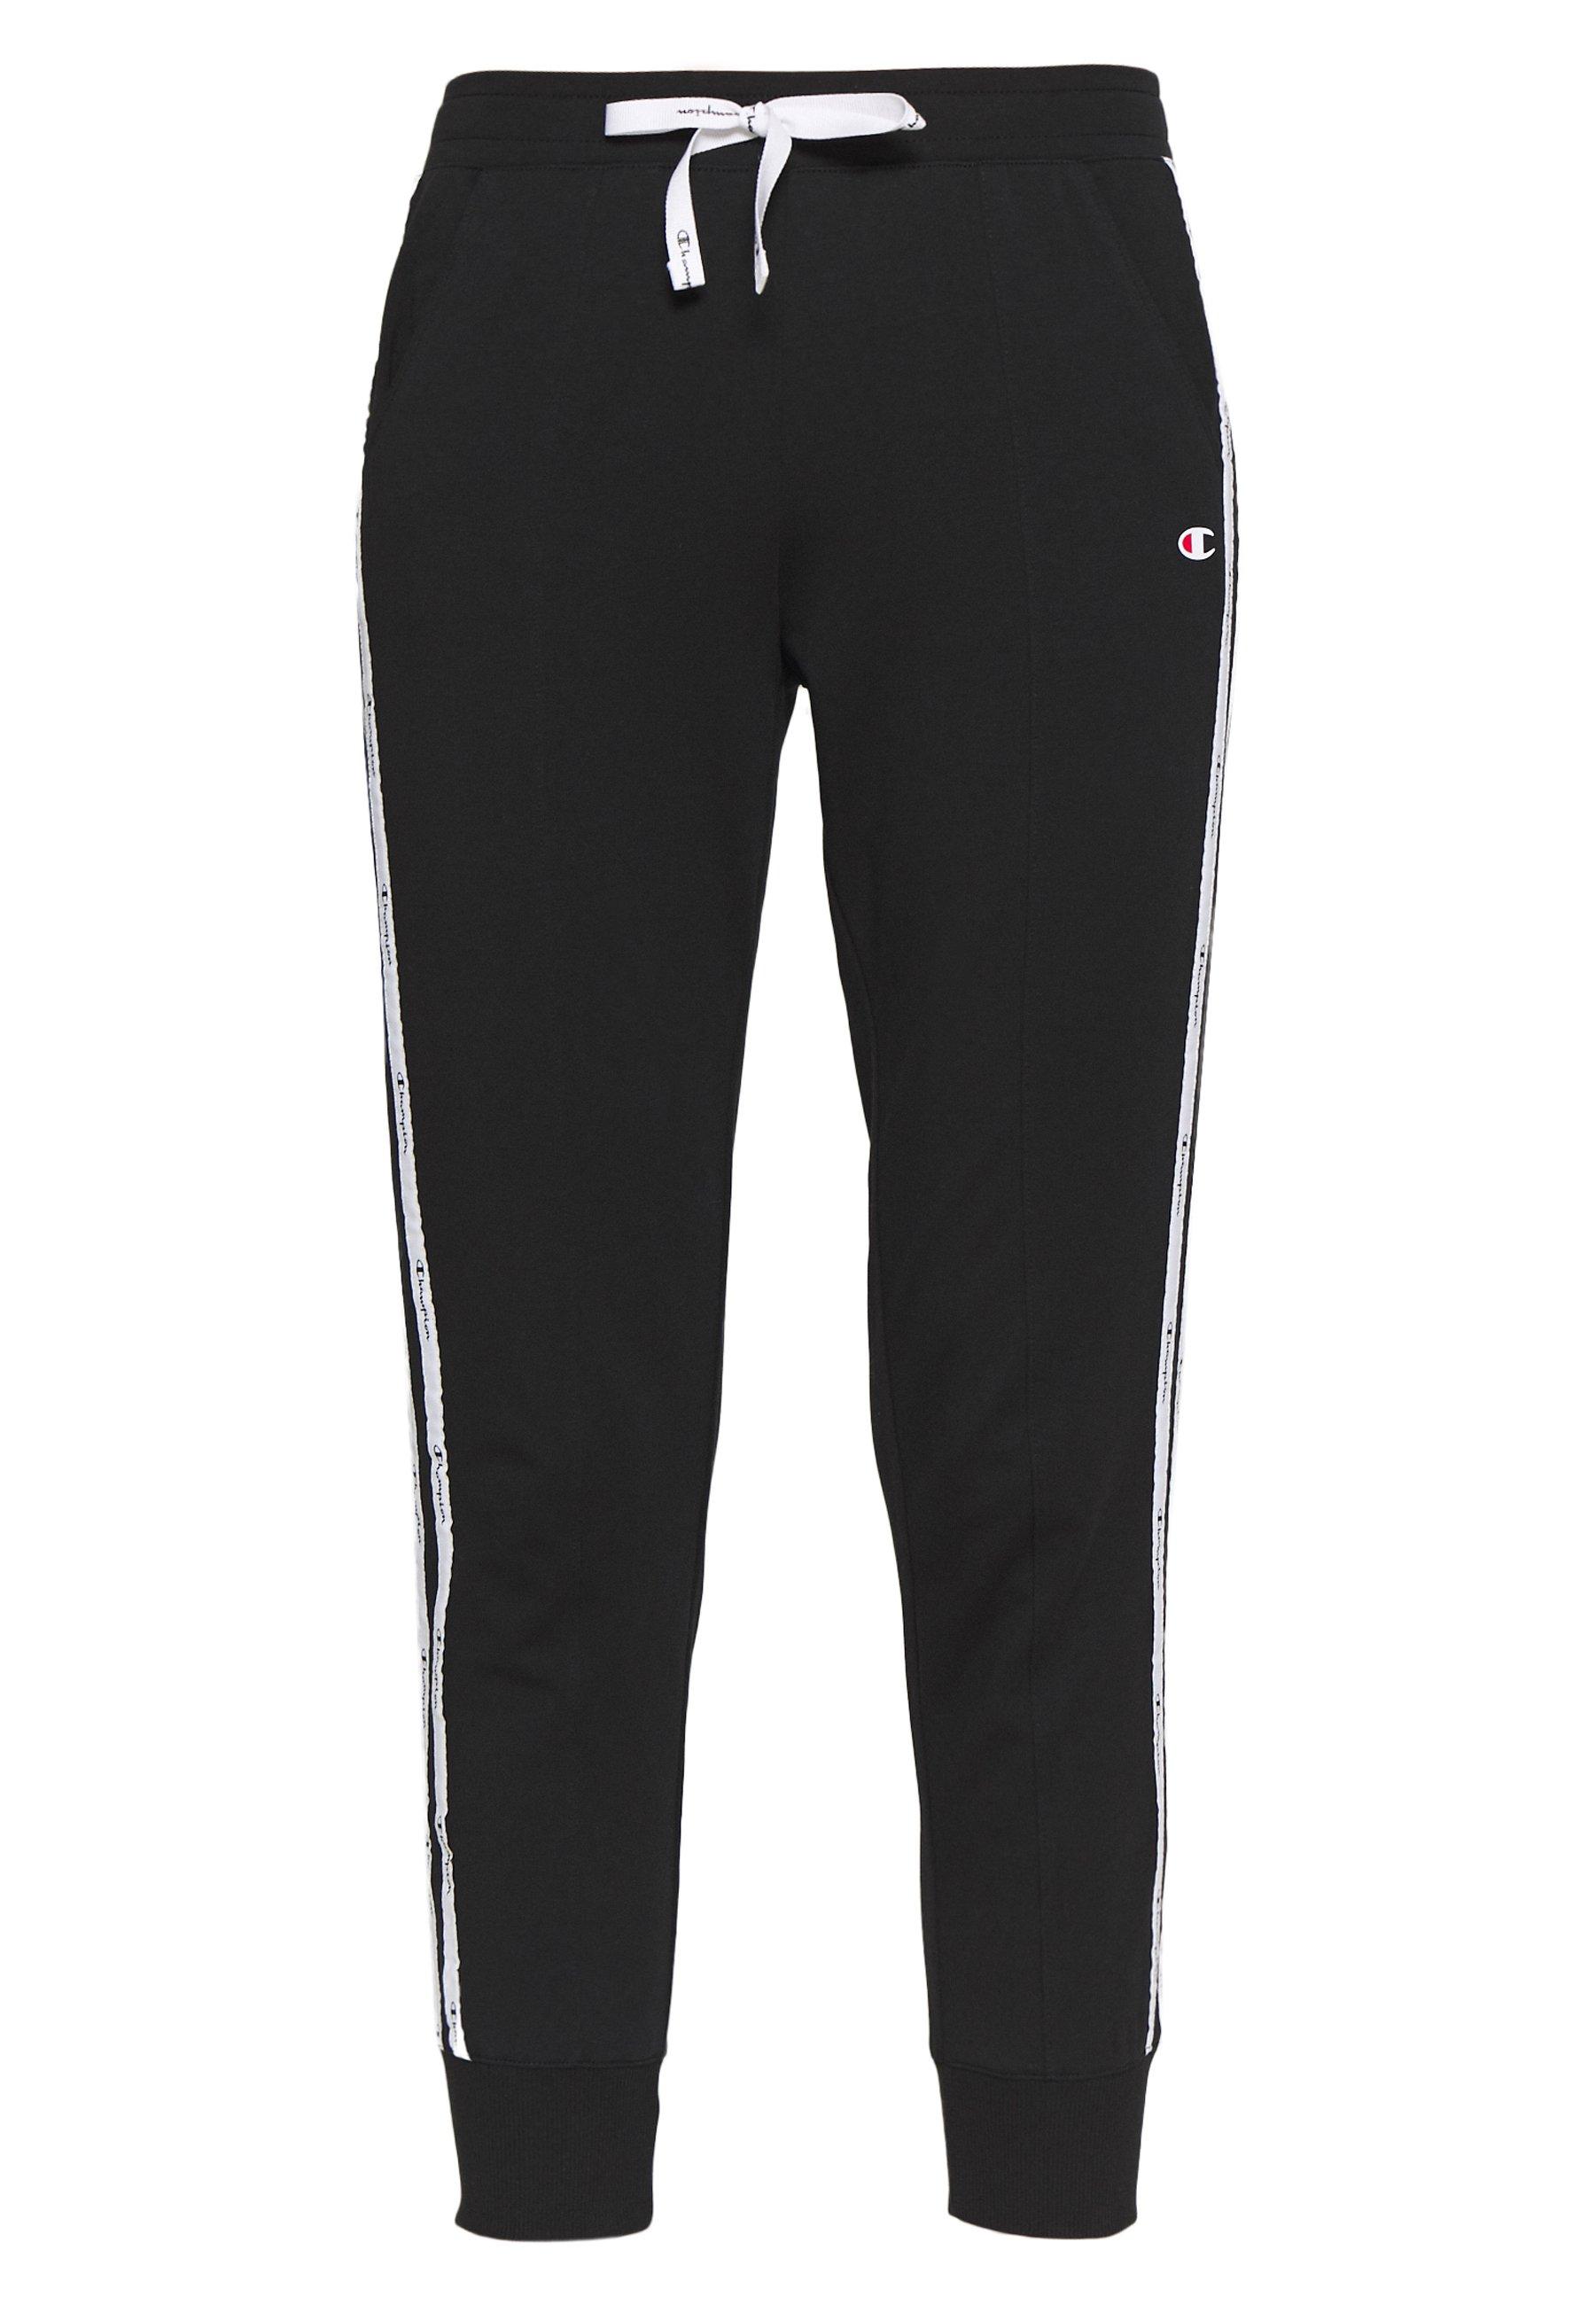 Femme RIB CUFF PANTS - Pantalon de survêtement